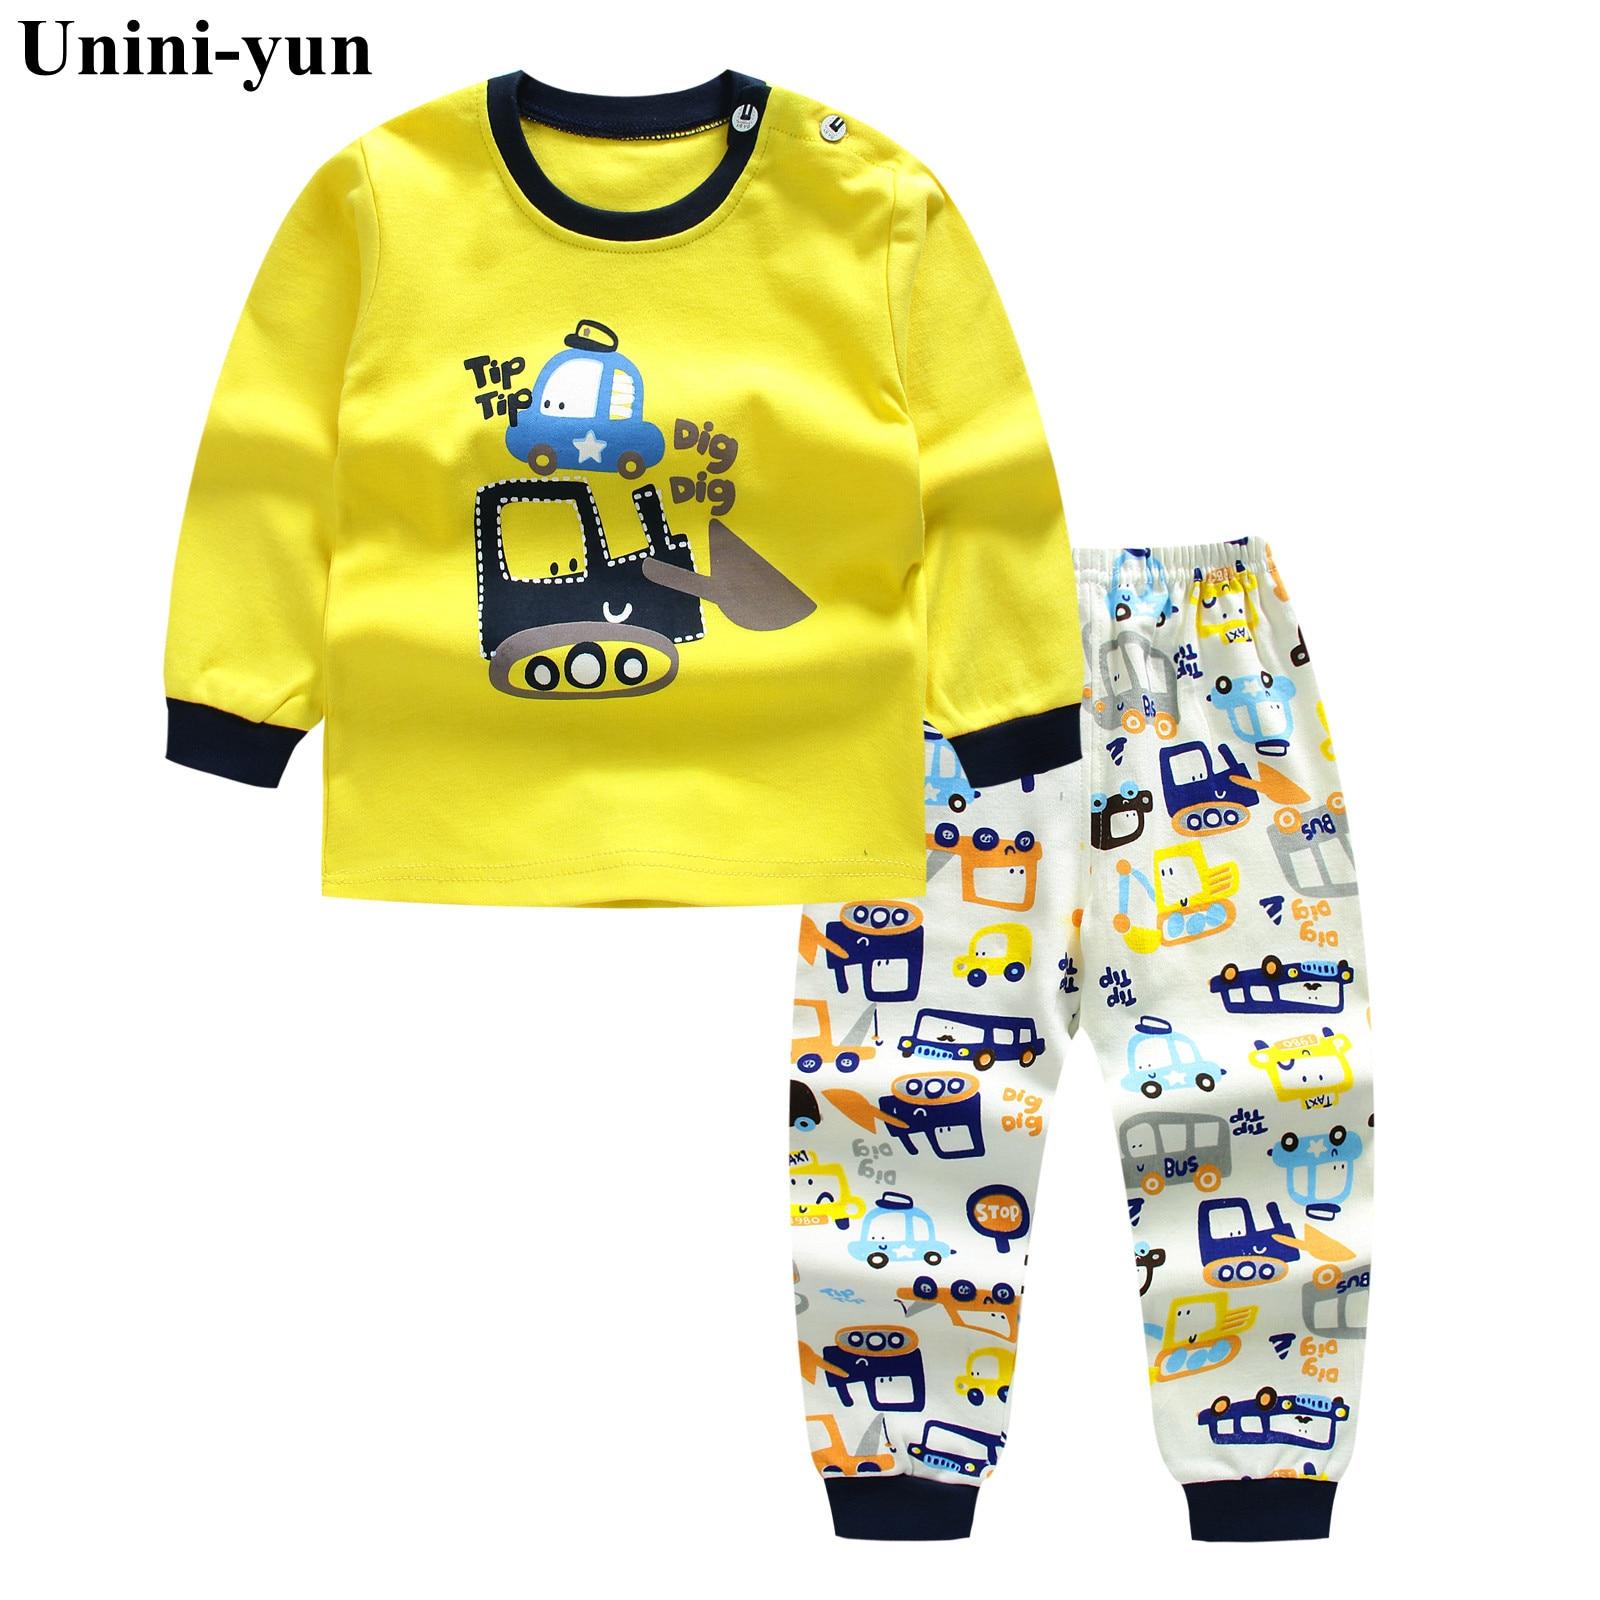 Dropwow Unini Yun Childrens Clothing Sets 2017 New Autumn Boys